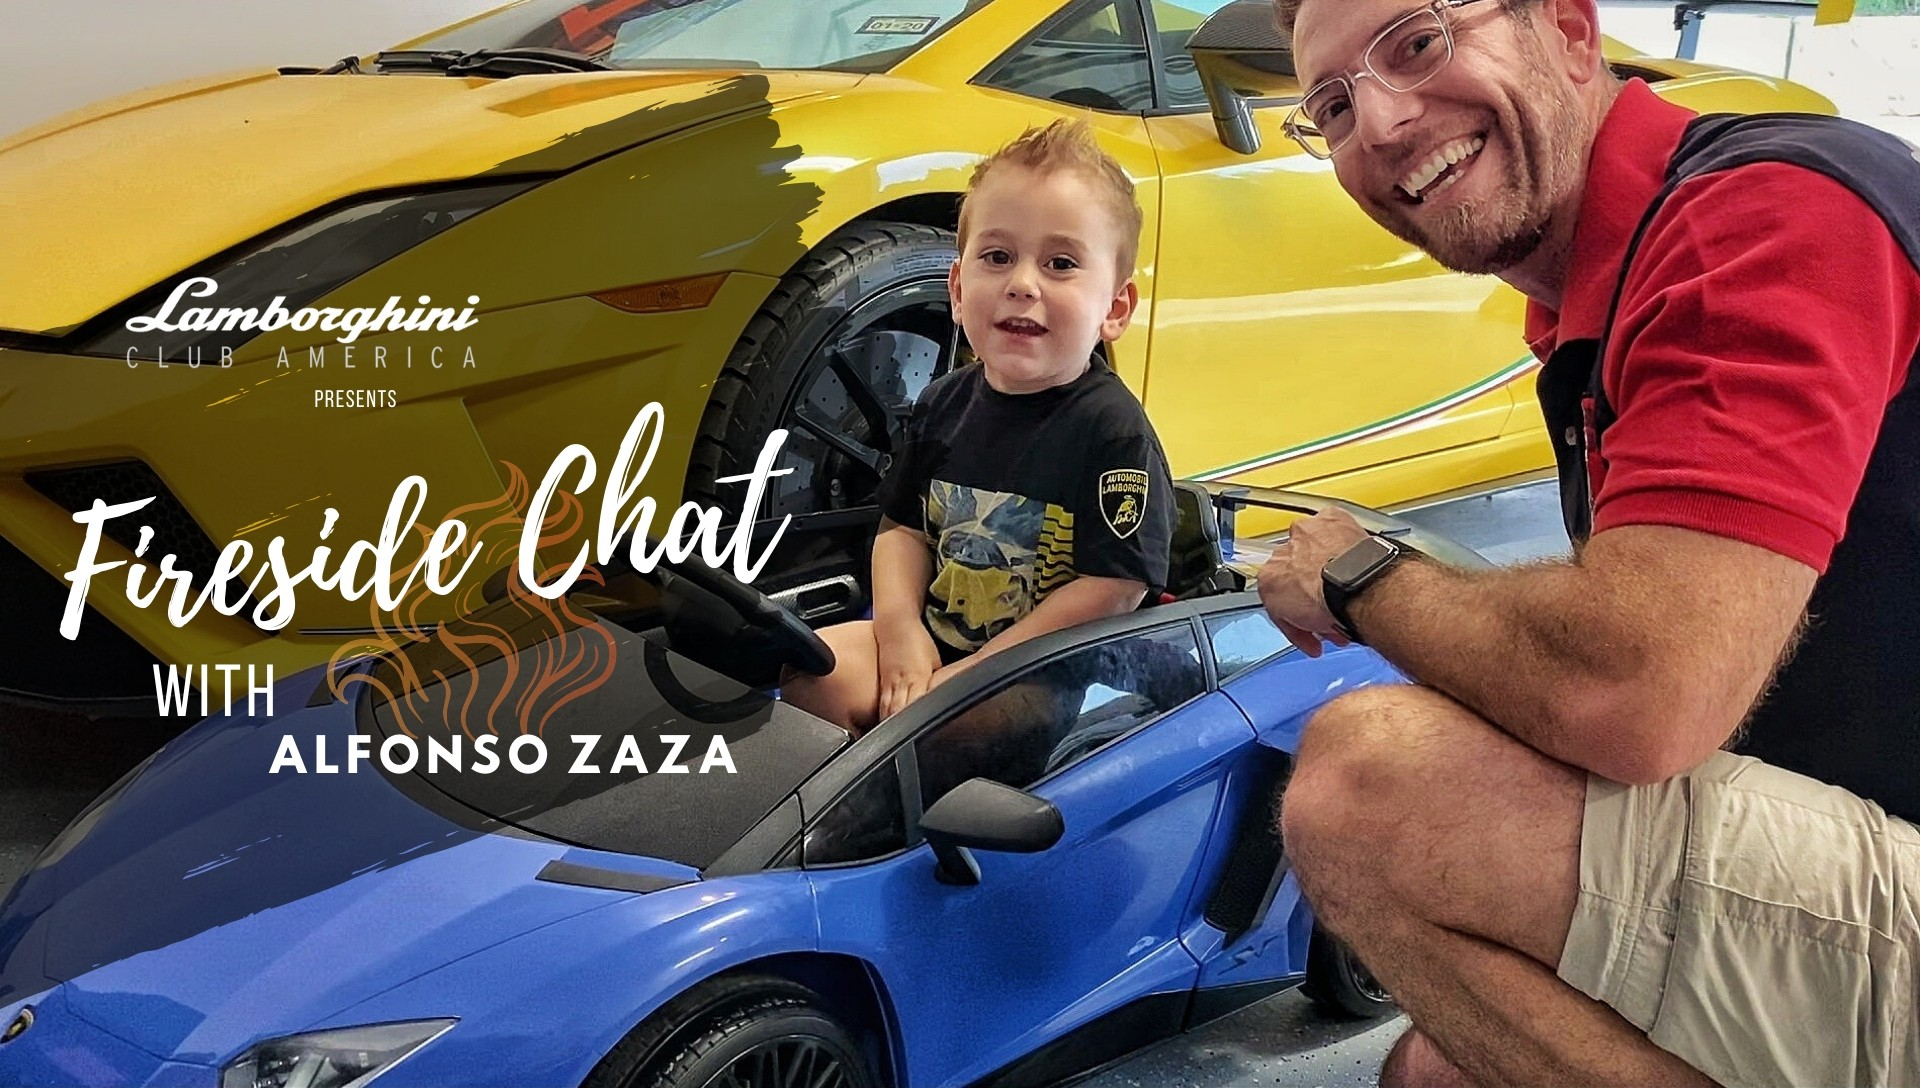 Lamborghini Club America Fireside Chat with Alfonso Zaza